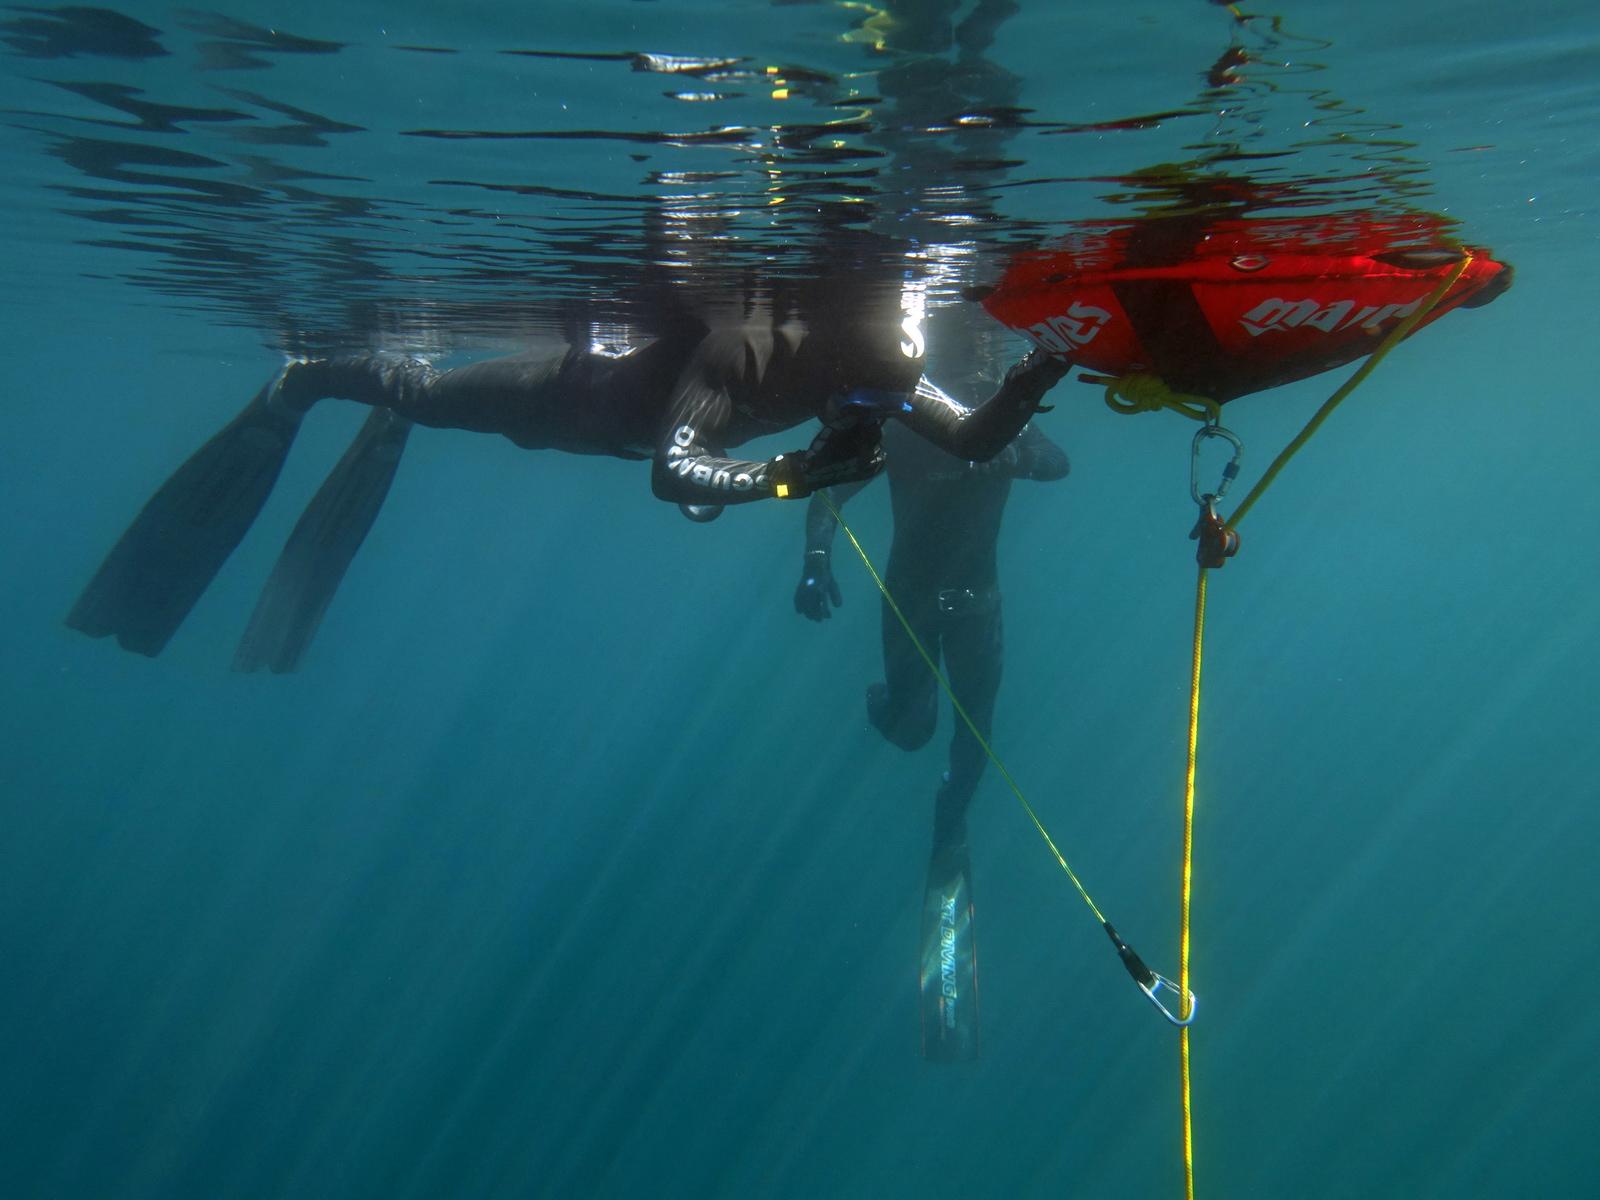 Freediver vor dem Apnoetauchgang